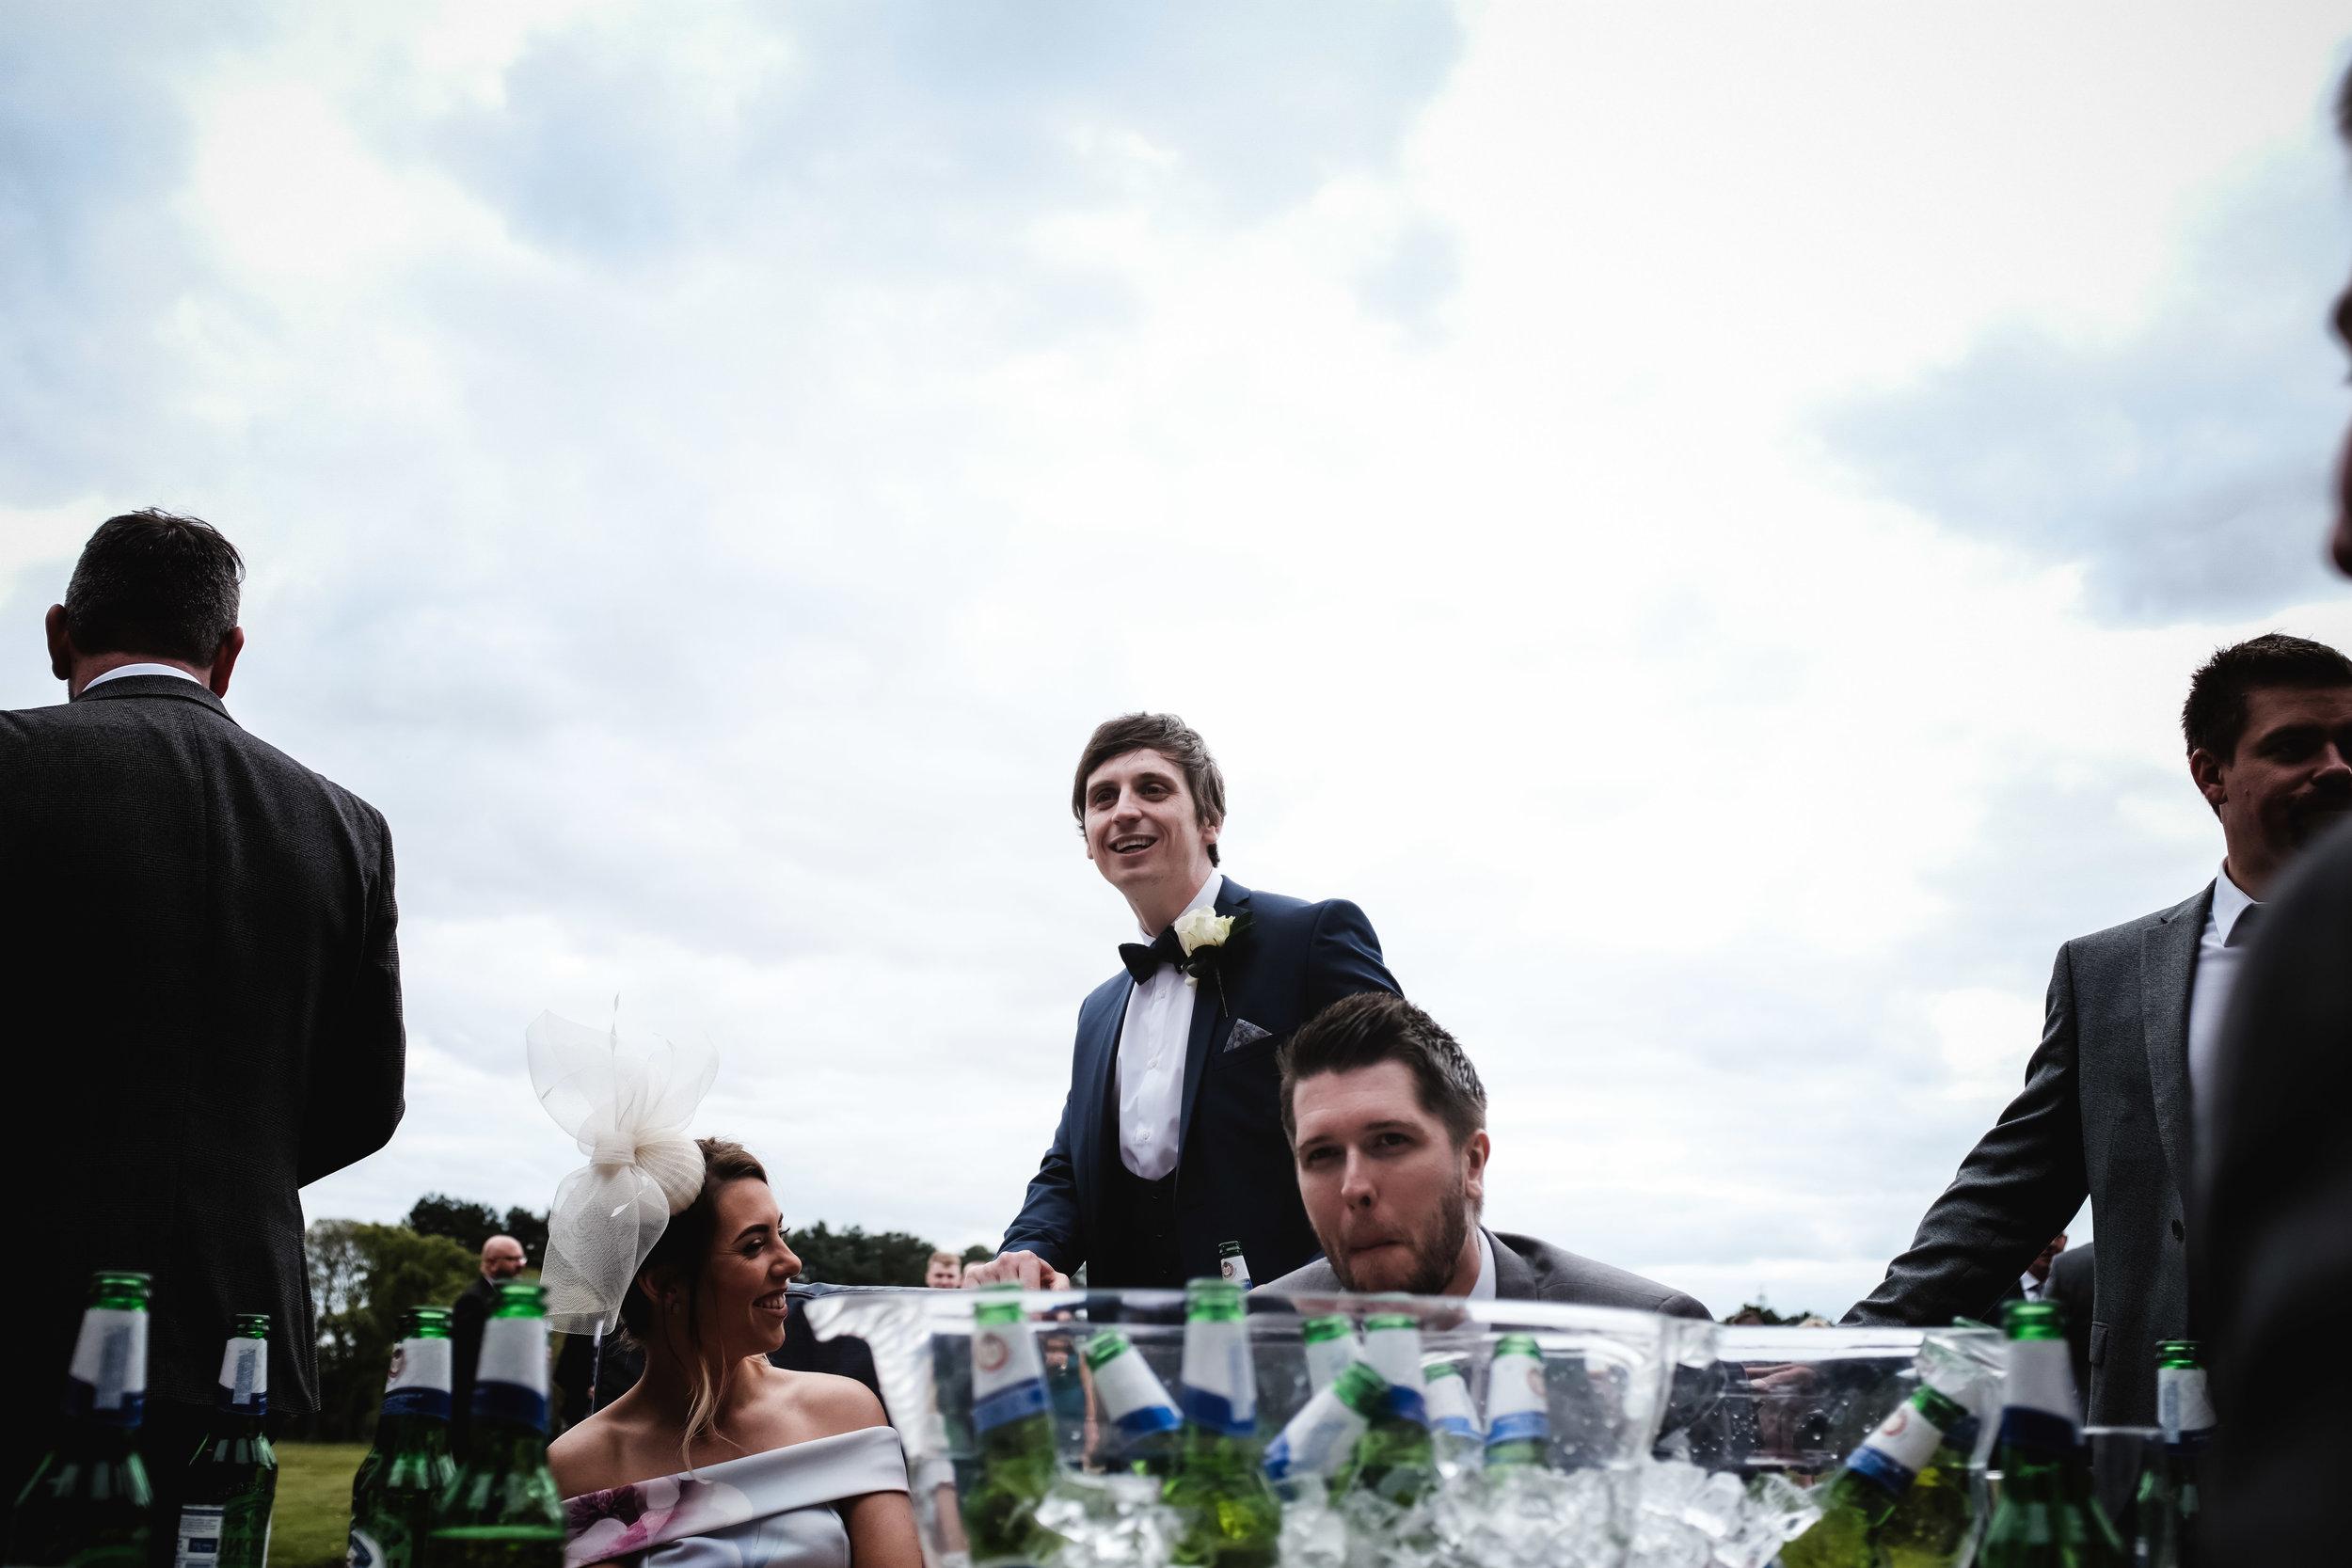 Thornton manor wedding photography cheshire wedding photographer liverpool manchester warrington chester wirral wedding BLOG (49 of 108).jpg